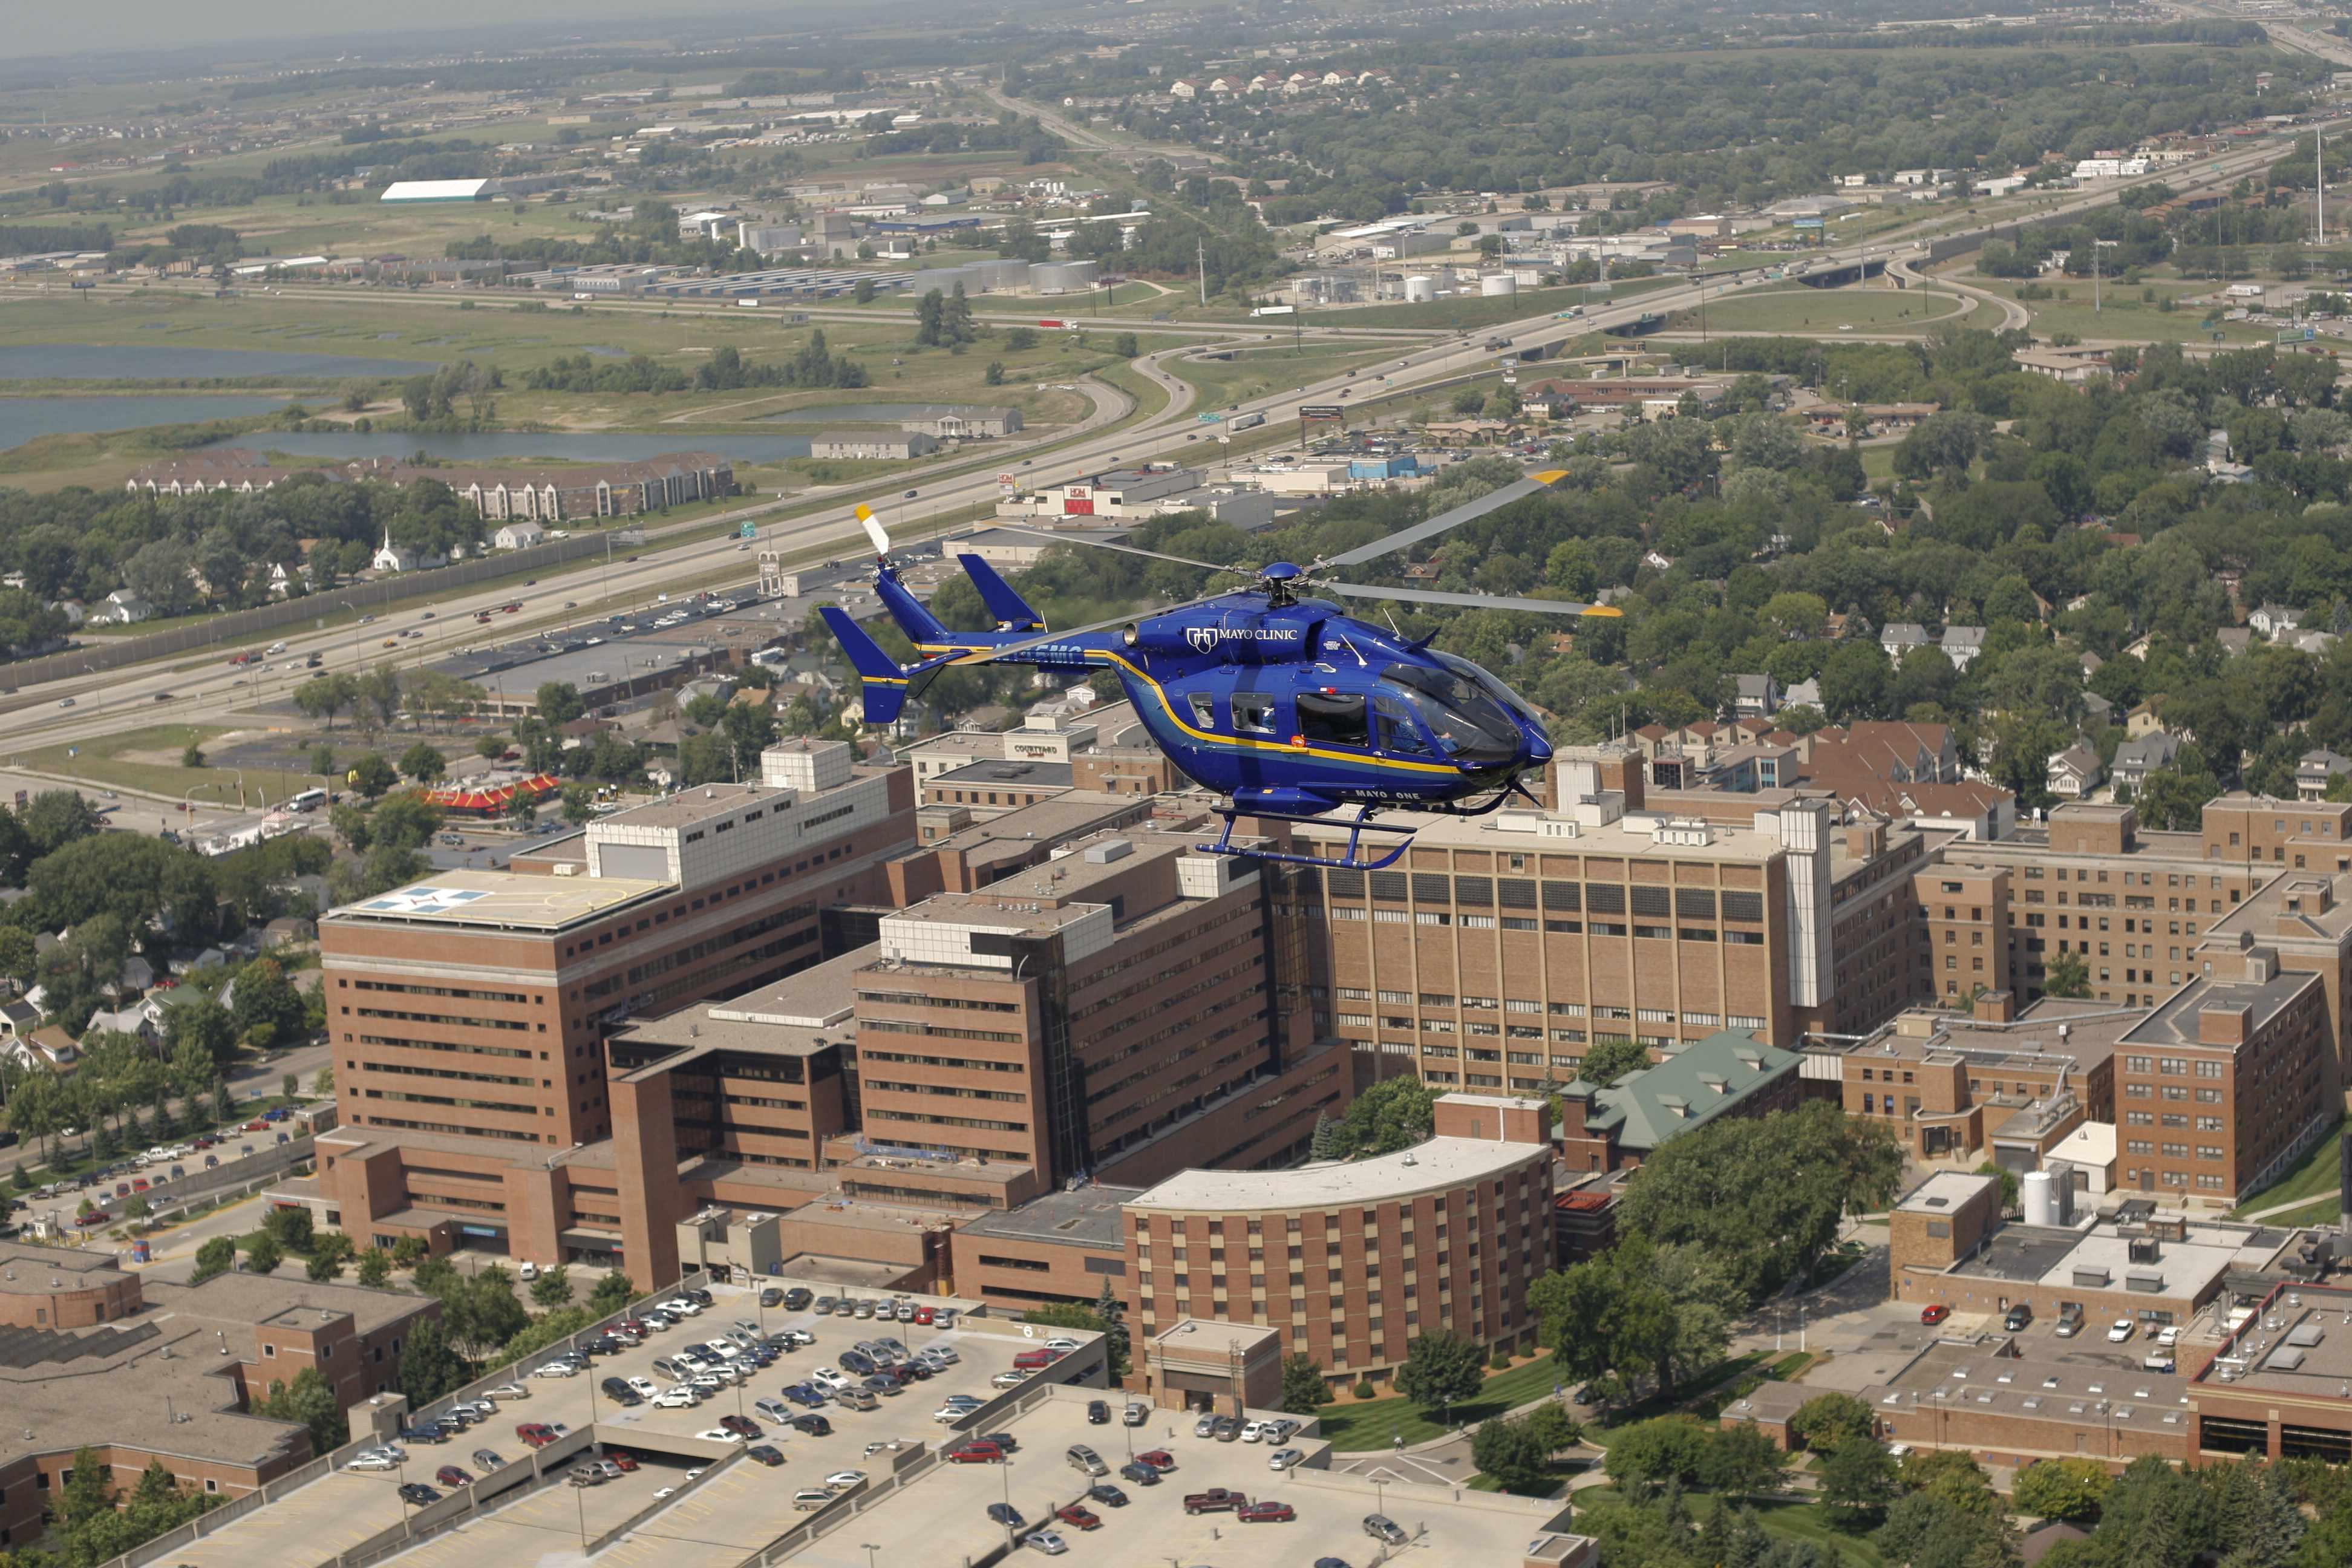 Mayo One helicopter over Mayo Clinic Hospital - Rochester, Saint Marys Campus Hospital